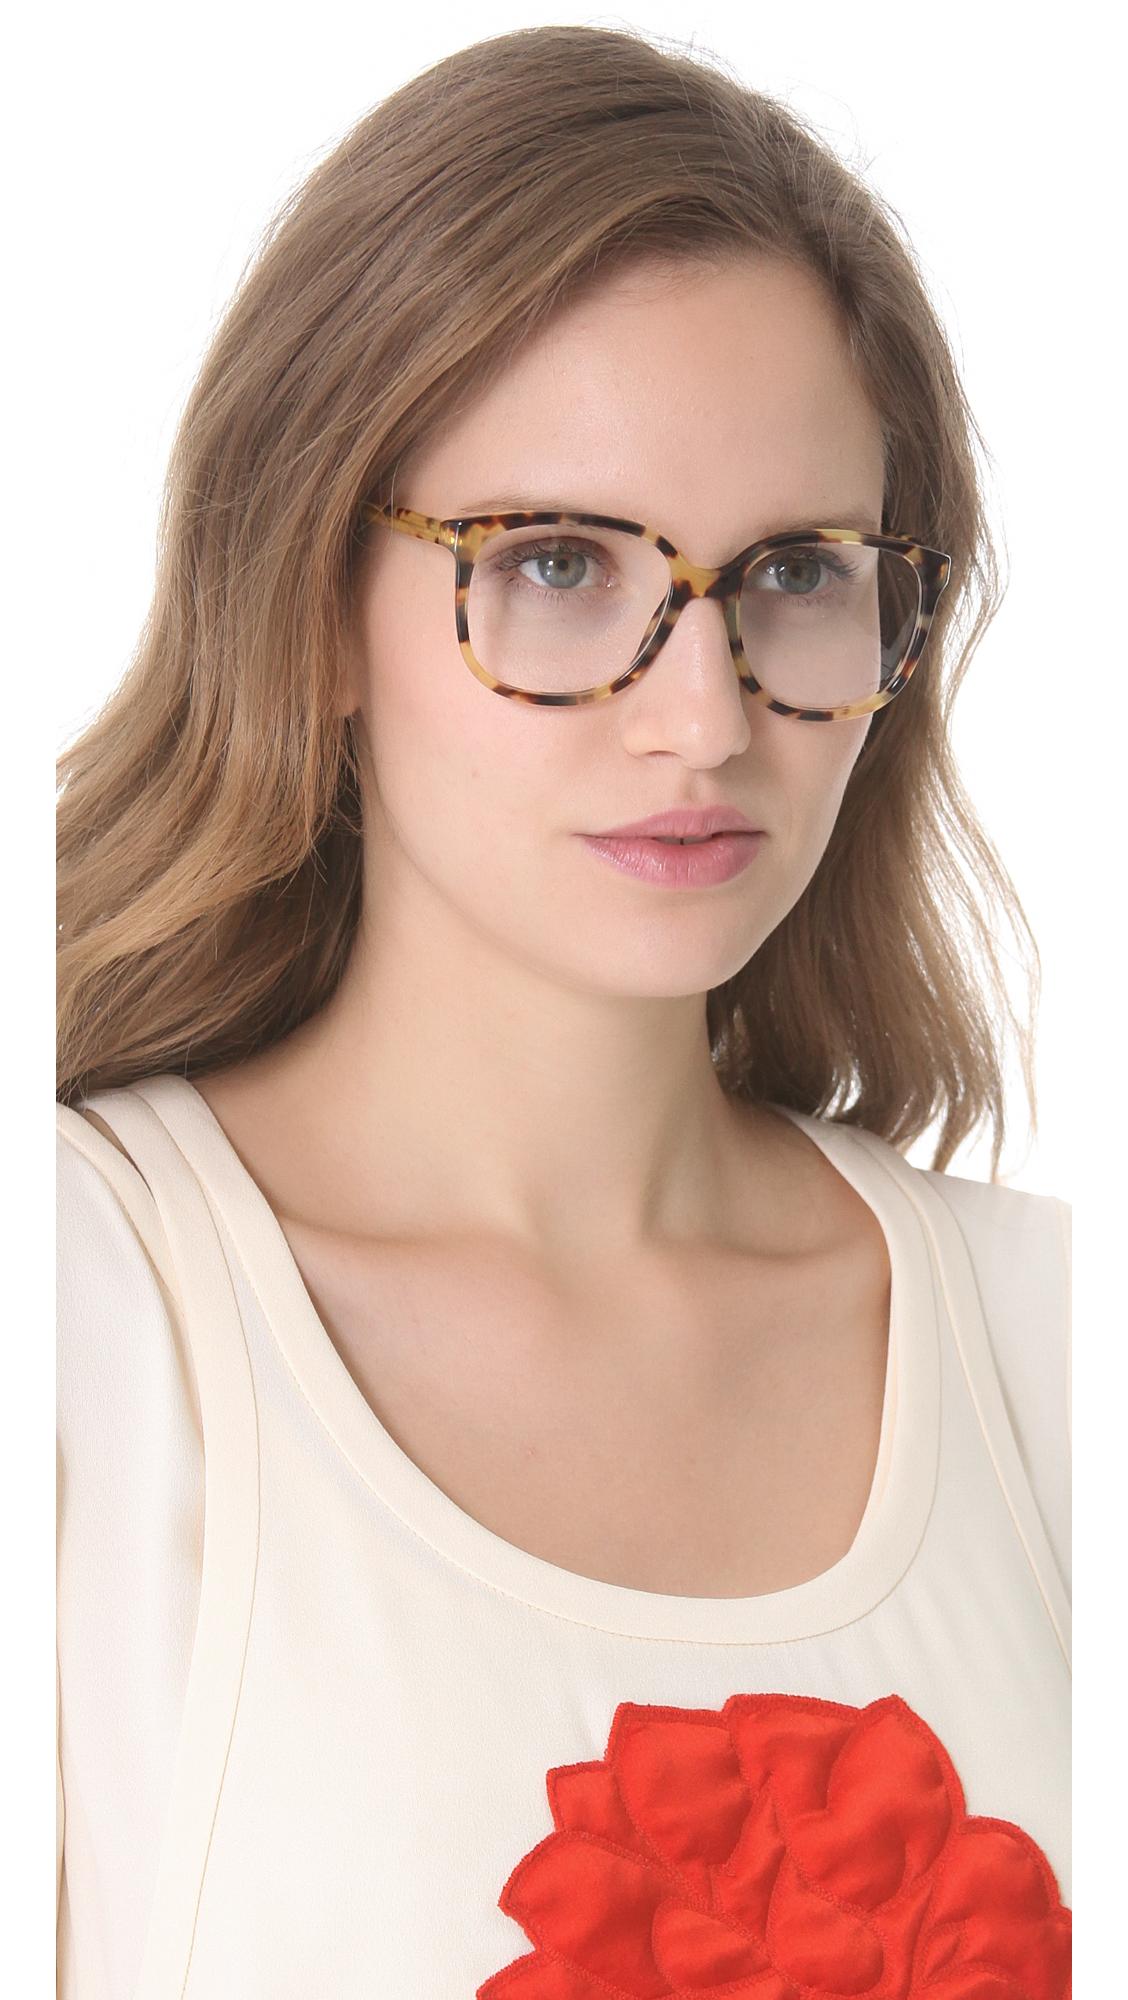 da25321c4b Stella McCartney Oversized Square Glasses